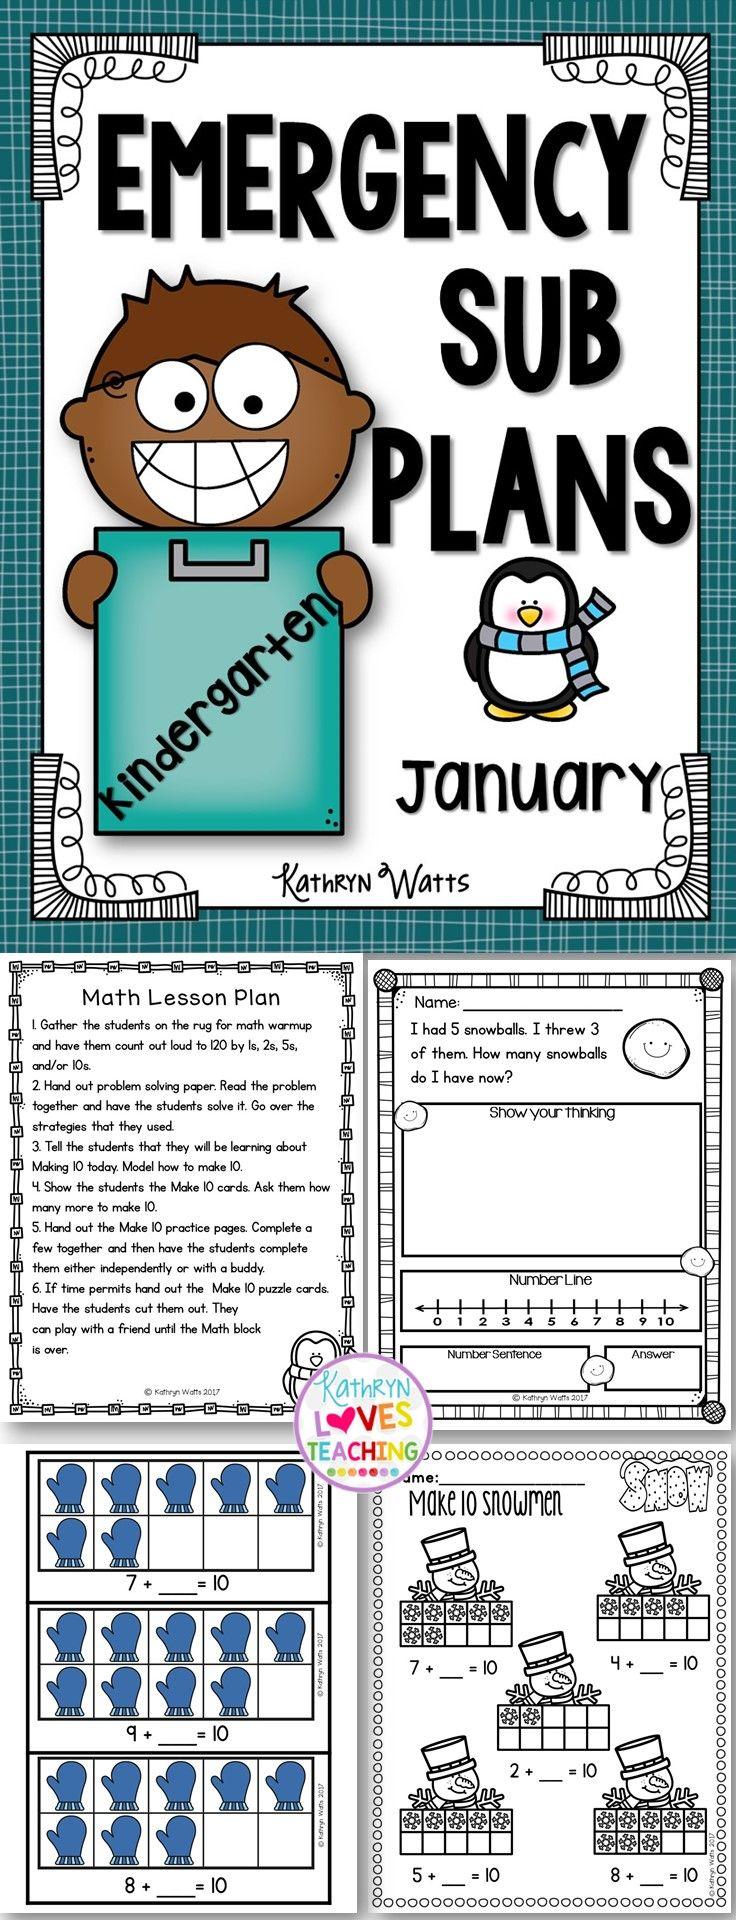 Kindergarten Emergency Sub Plans January